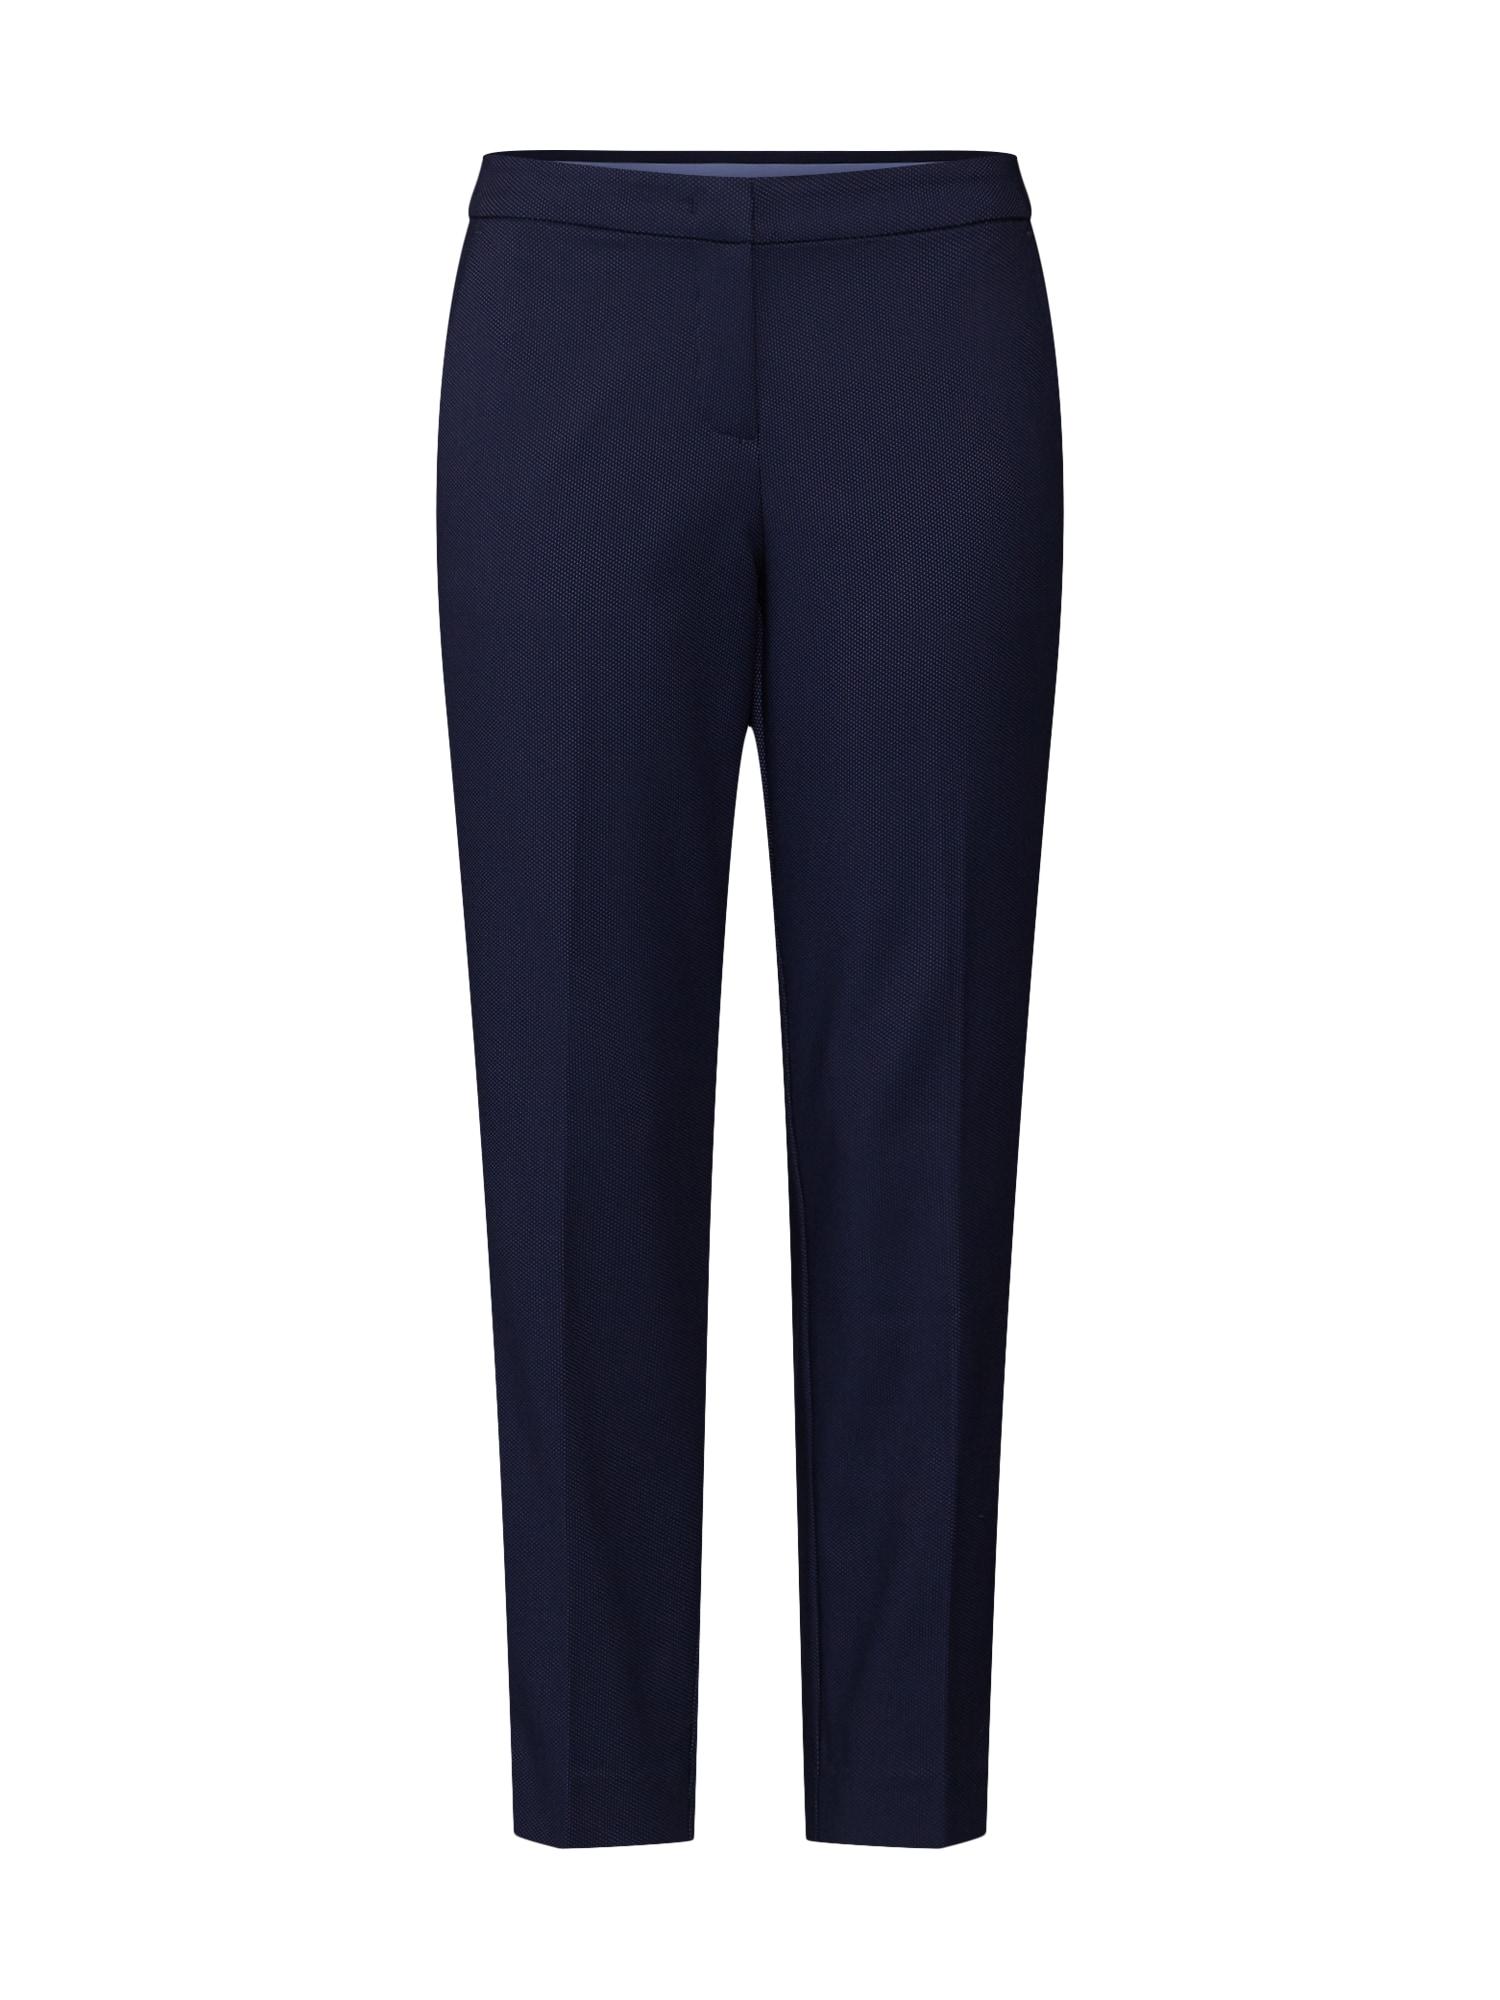 Kalhoty s puky Mia tmavě modrá TOM TAILOR